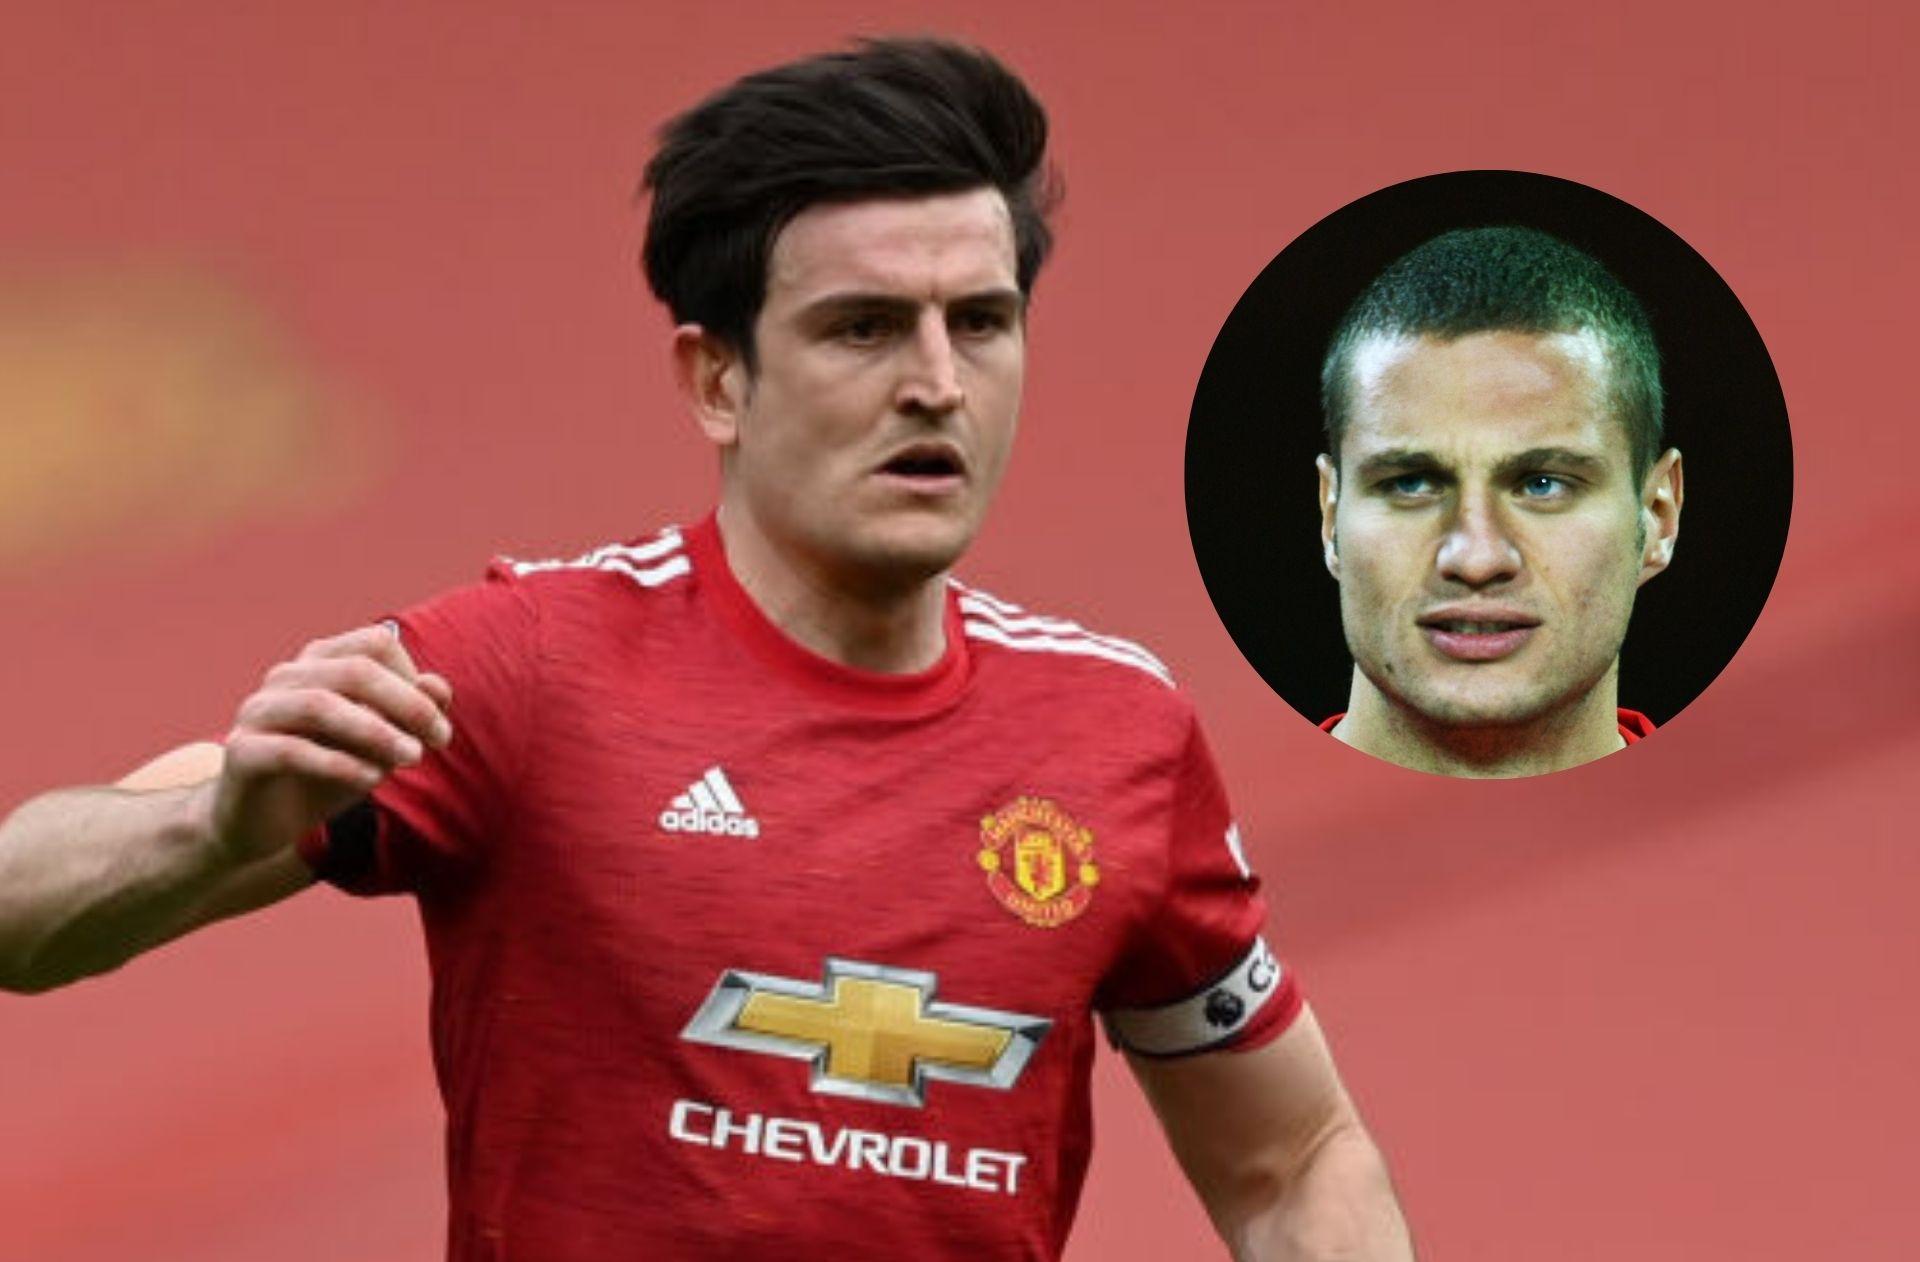 Harry Maguire, Nemanja Vidic - Manchester United